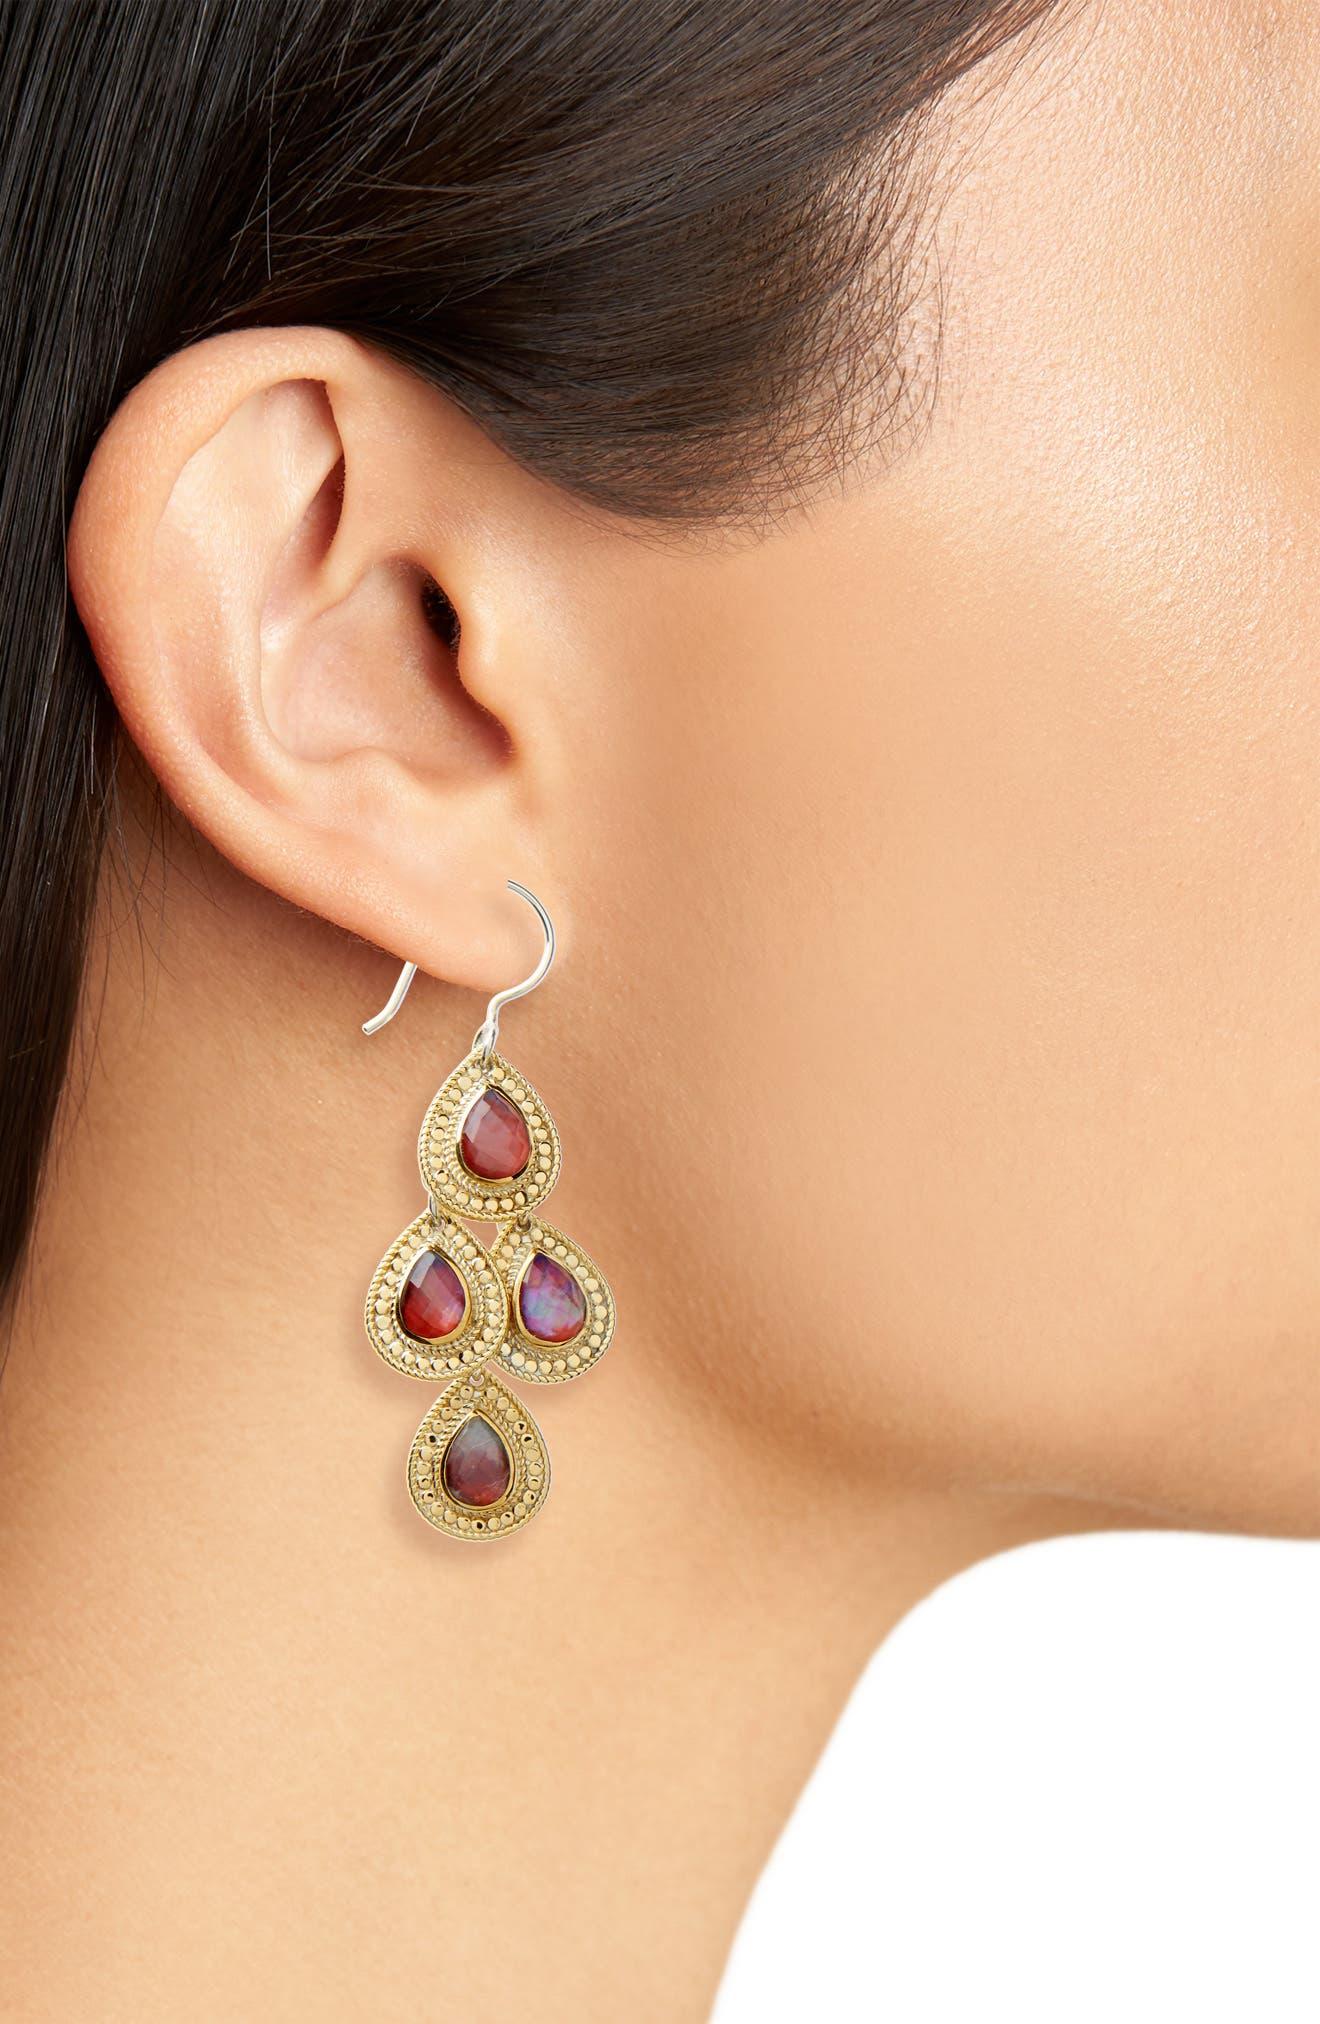 Stone Chandelier Earrings,                             Alternate thumbnail 2, color,                             Gold/ Silver/ Garnet